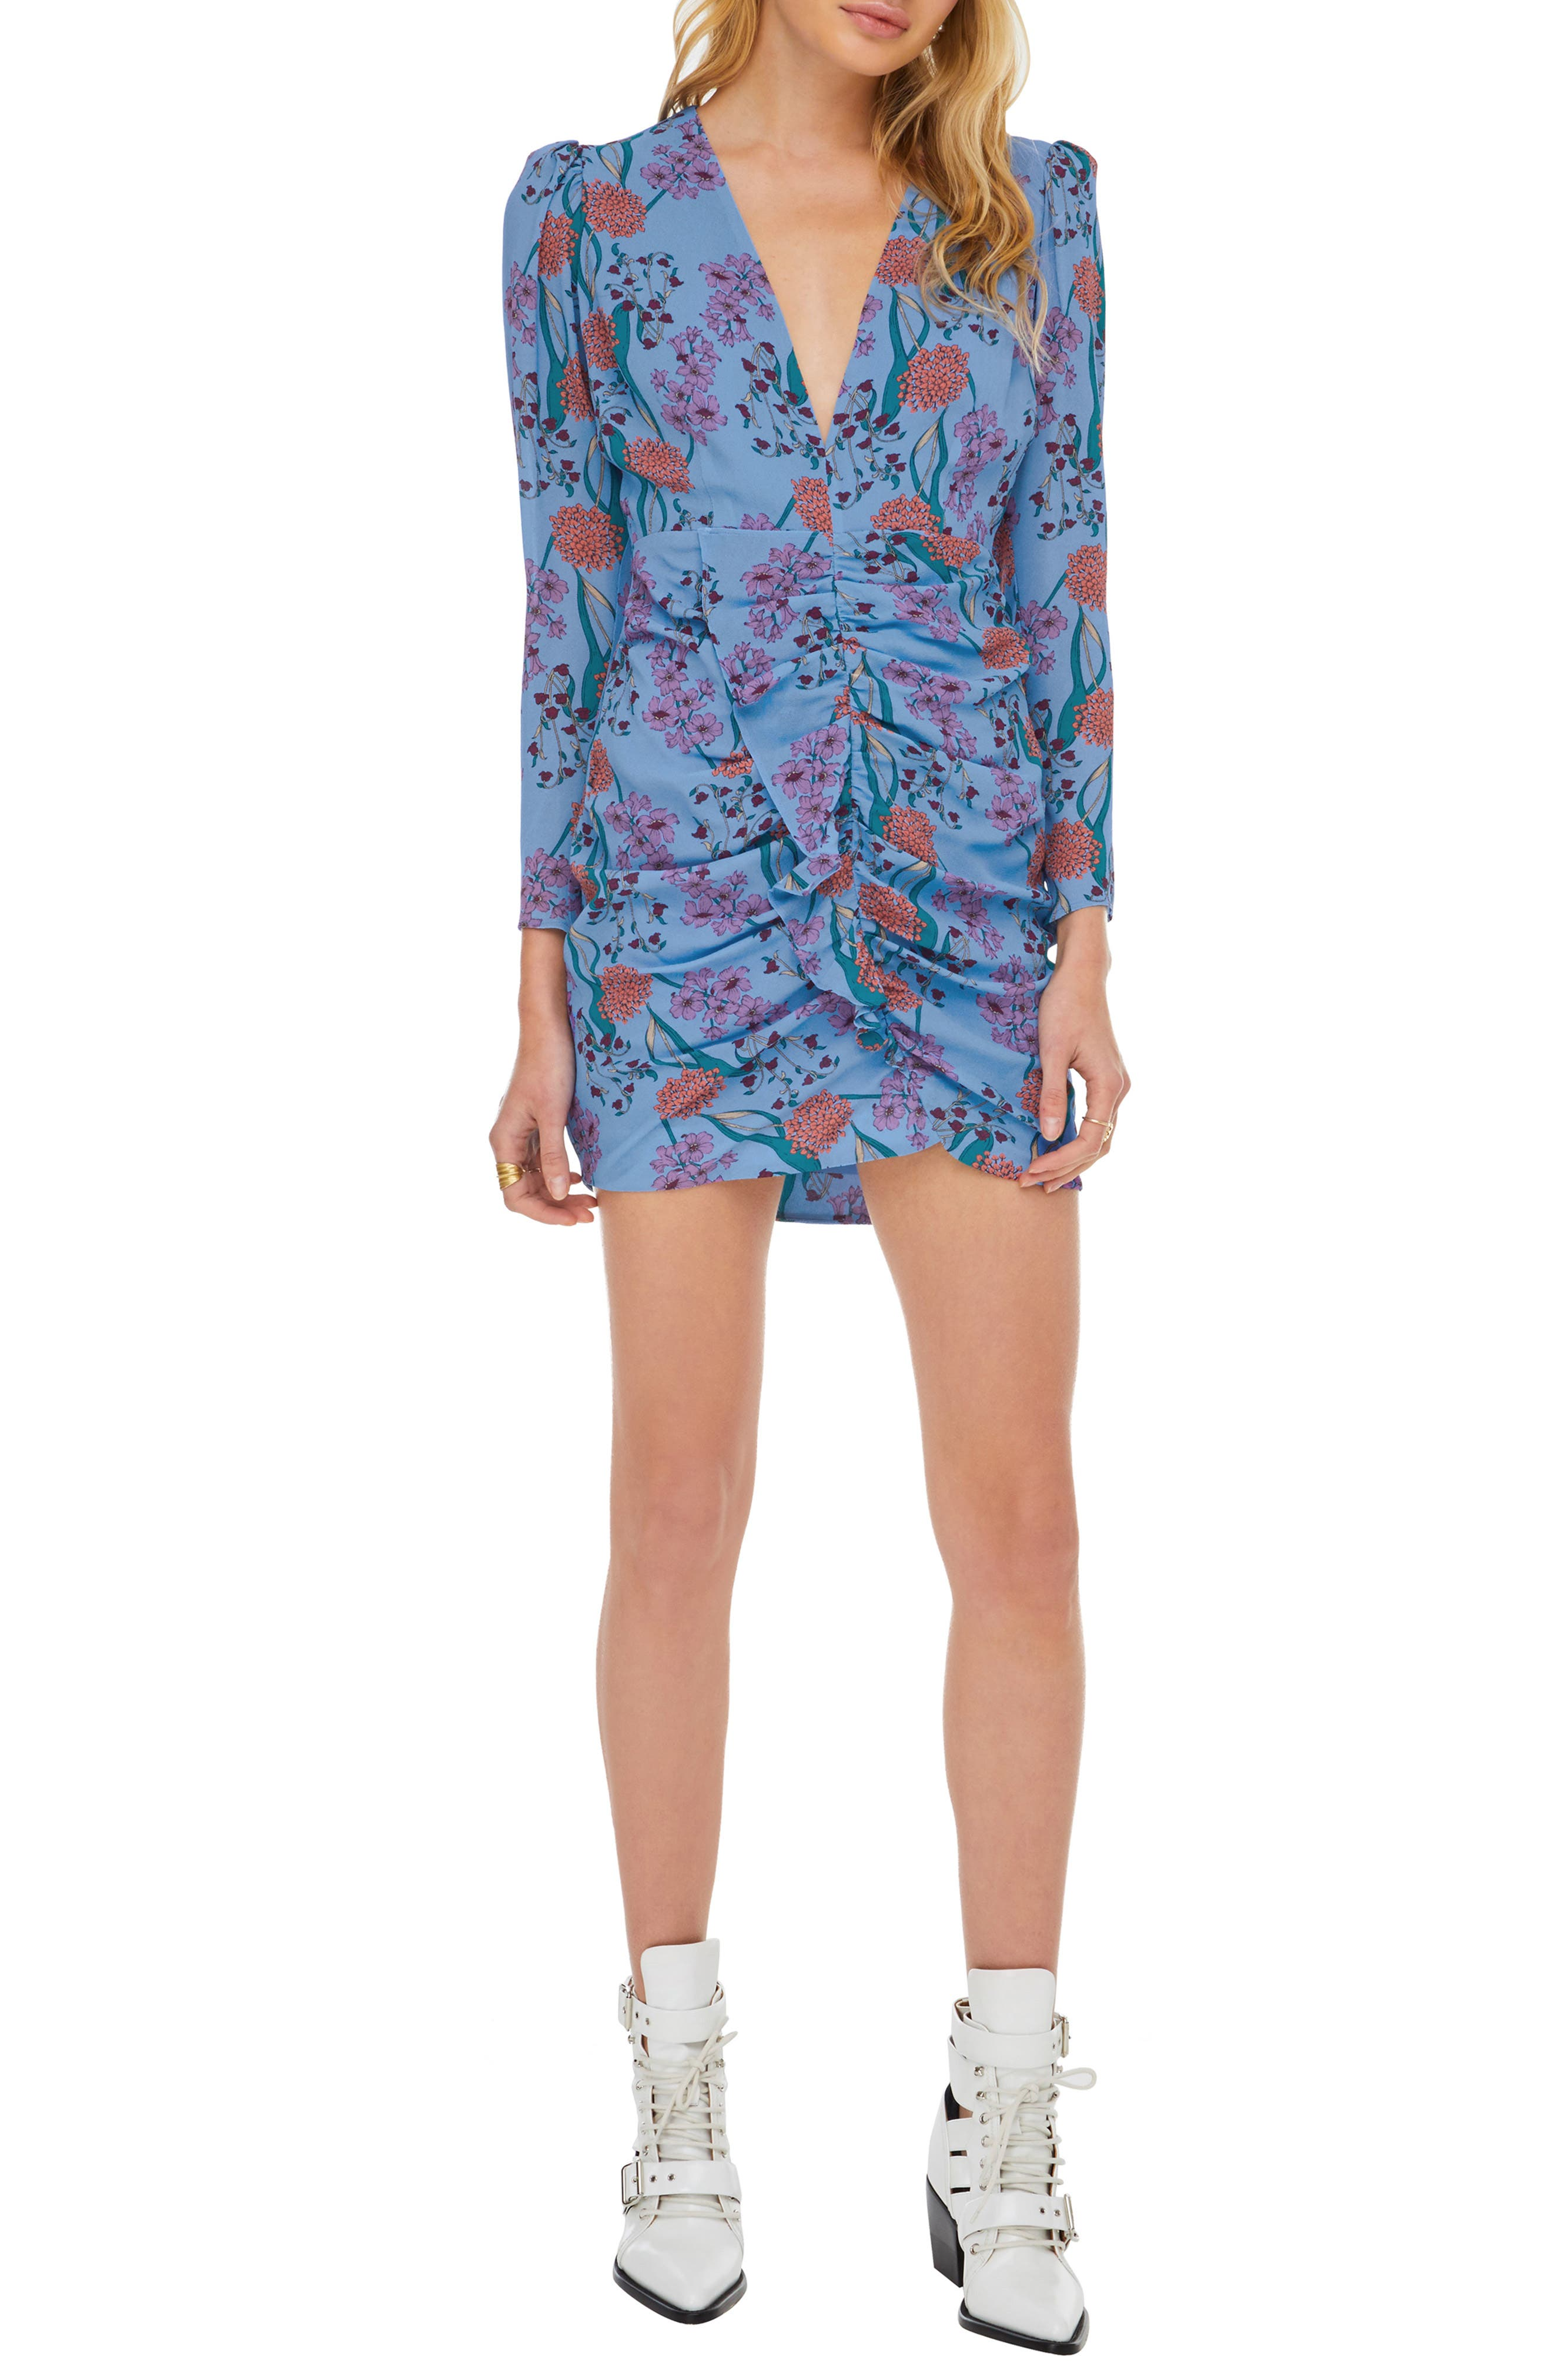 ASTR THE LABEL,                             Vignette Floral Print Dress,                             Main thumbnail 1, color,                             BLUEBELL FLORAL